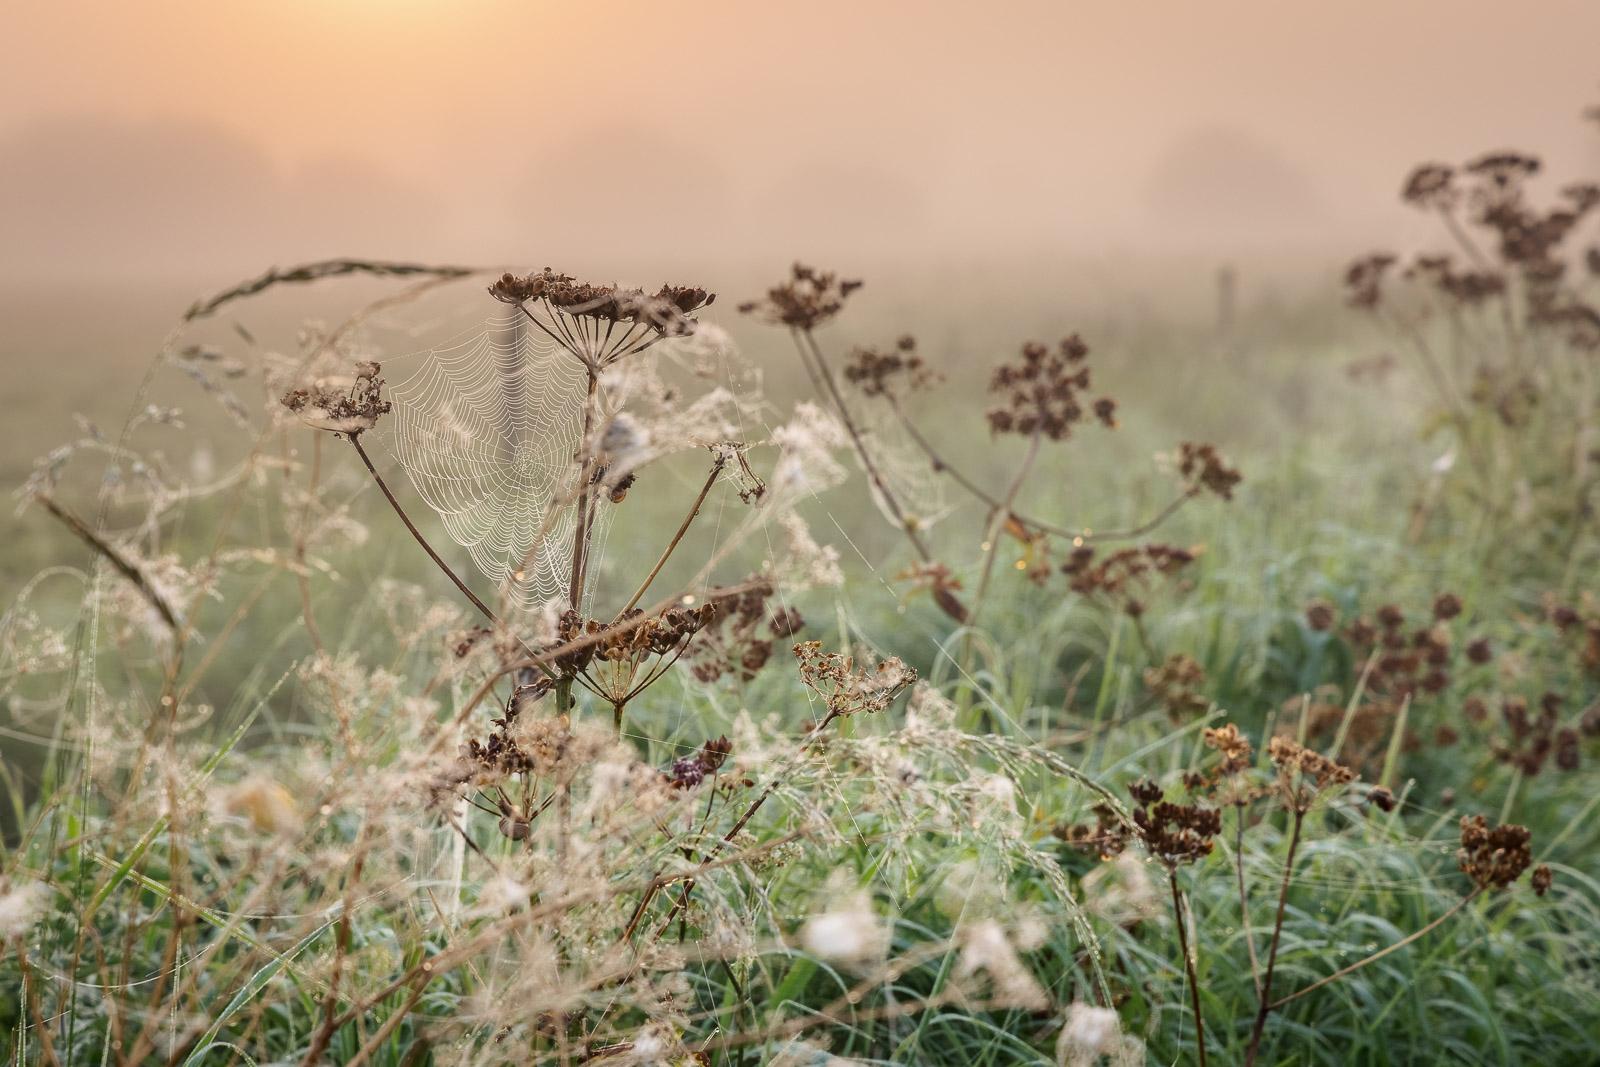 Early morning cobwebs - Queens Sedge Moor, Nr Glastonbury, Somerset, UK. ID BR54720